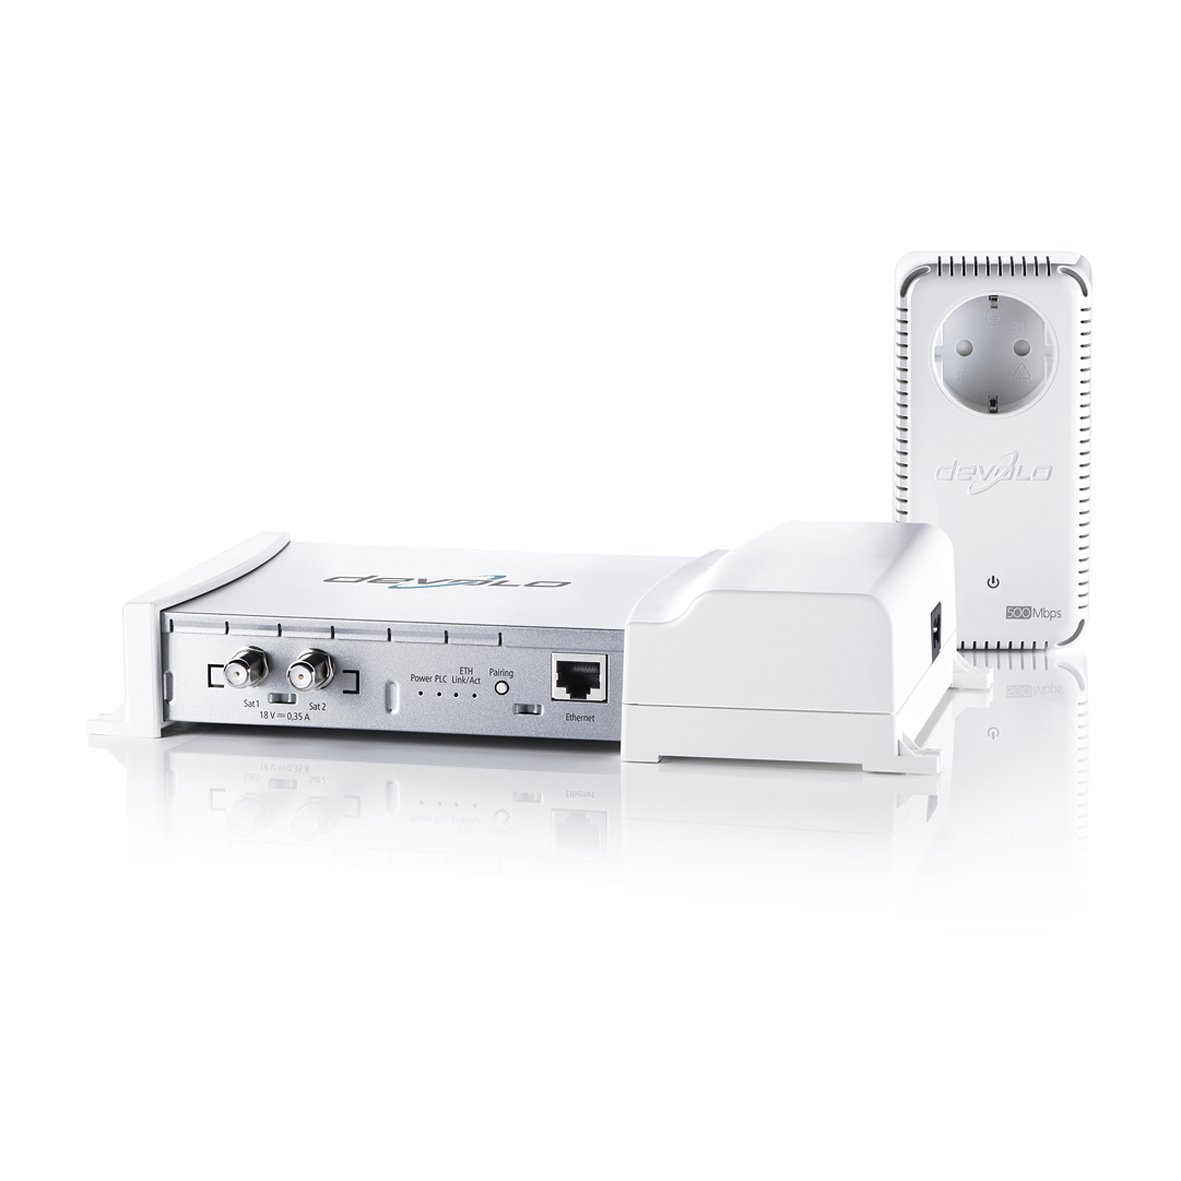 Devolo dLAN TV SAT Multituner Kit weiß: Amazon.de: Elektronik